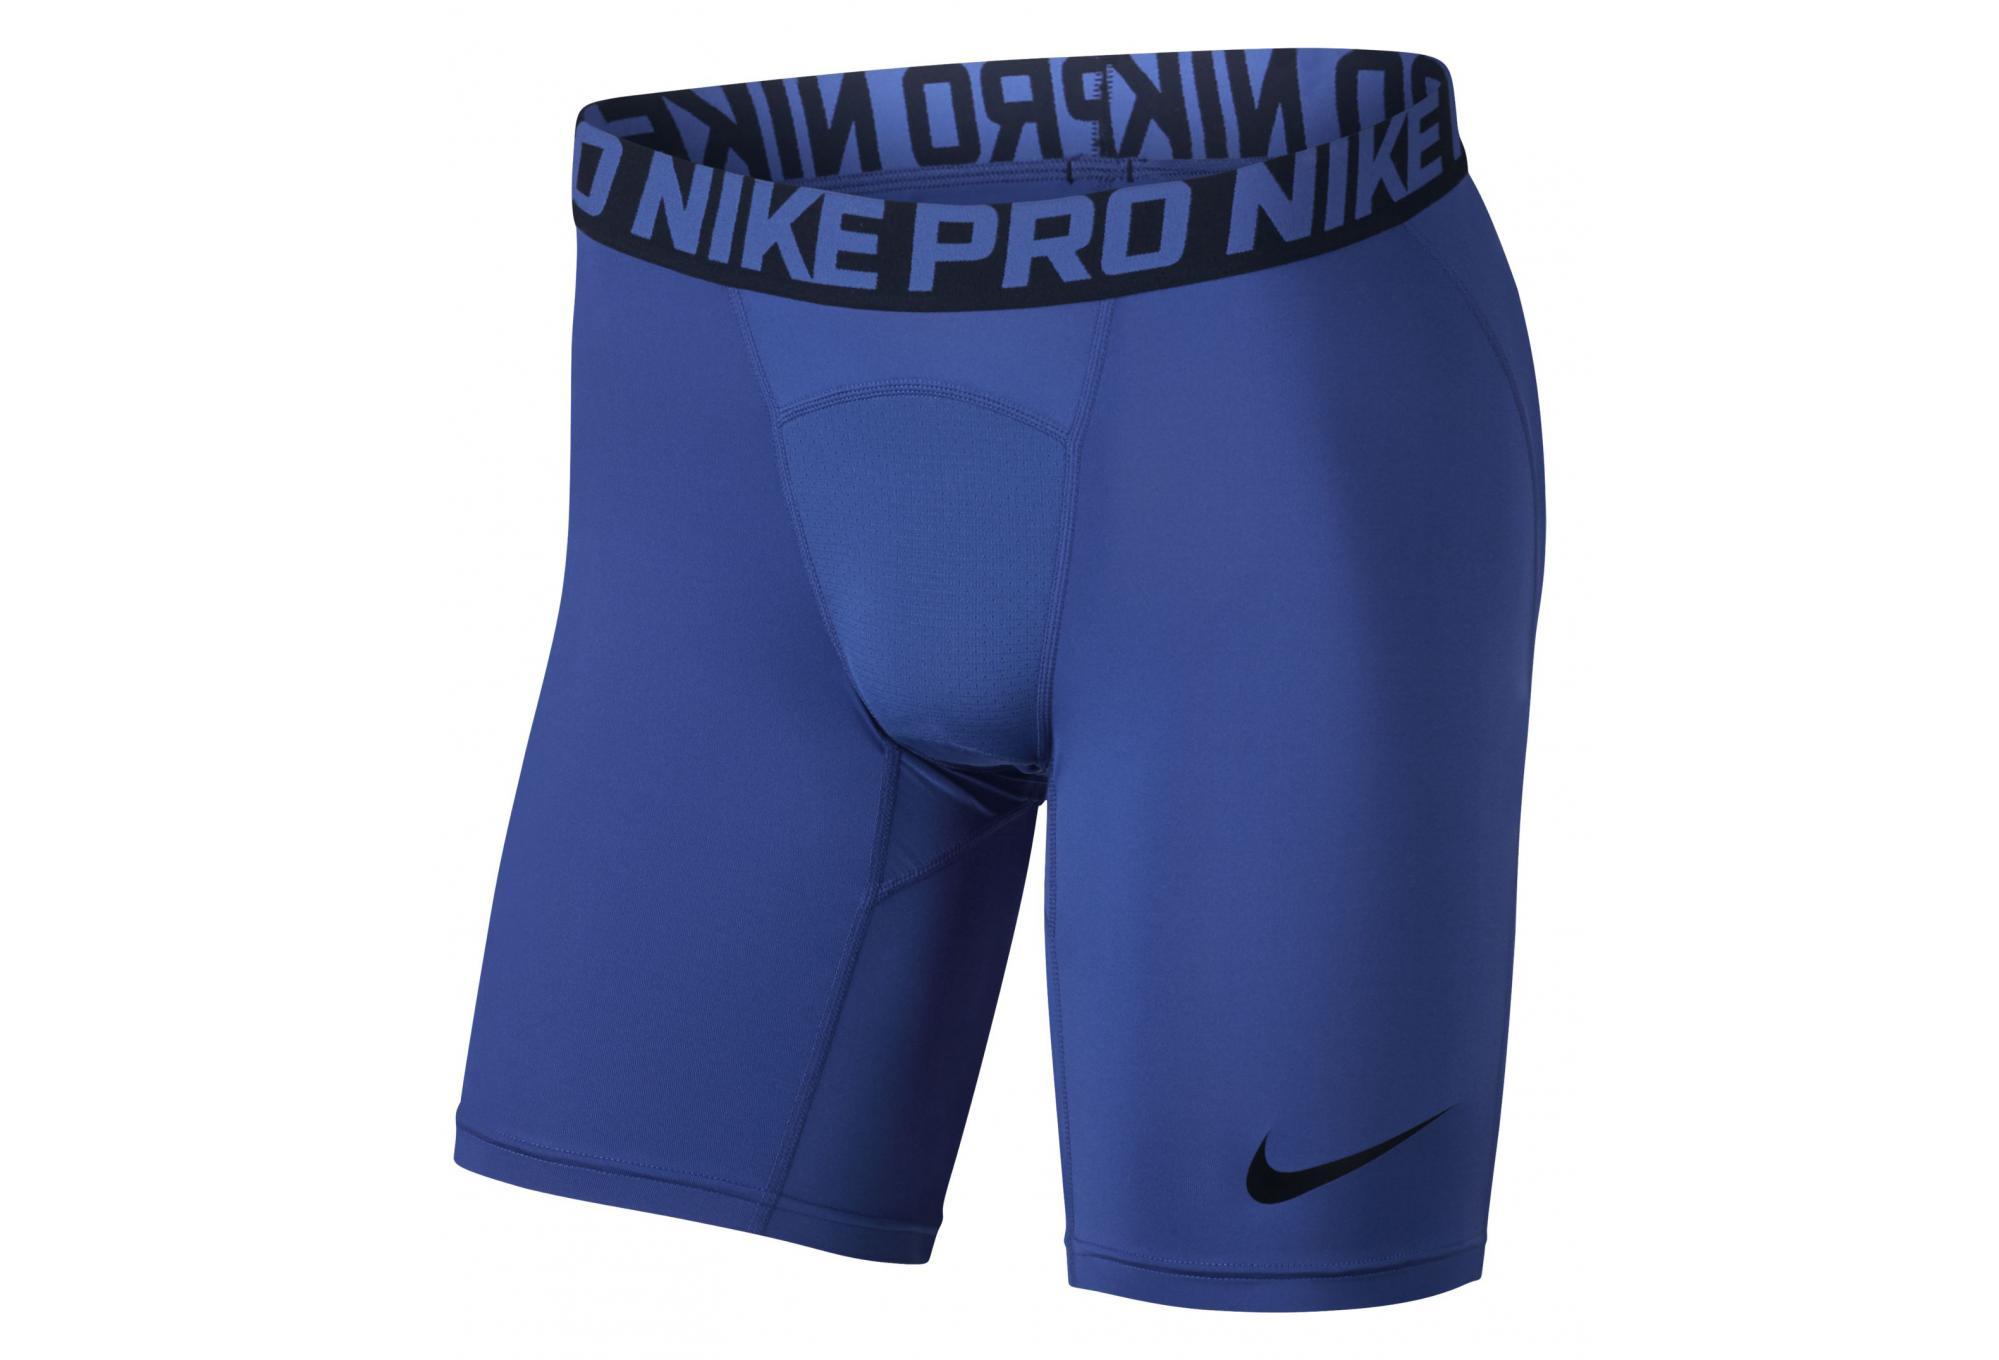 Compression Bleu Cuissard Pro De Nike Homme b7Y6gyvf